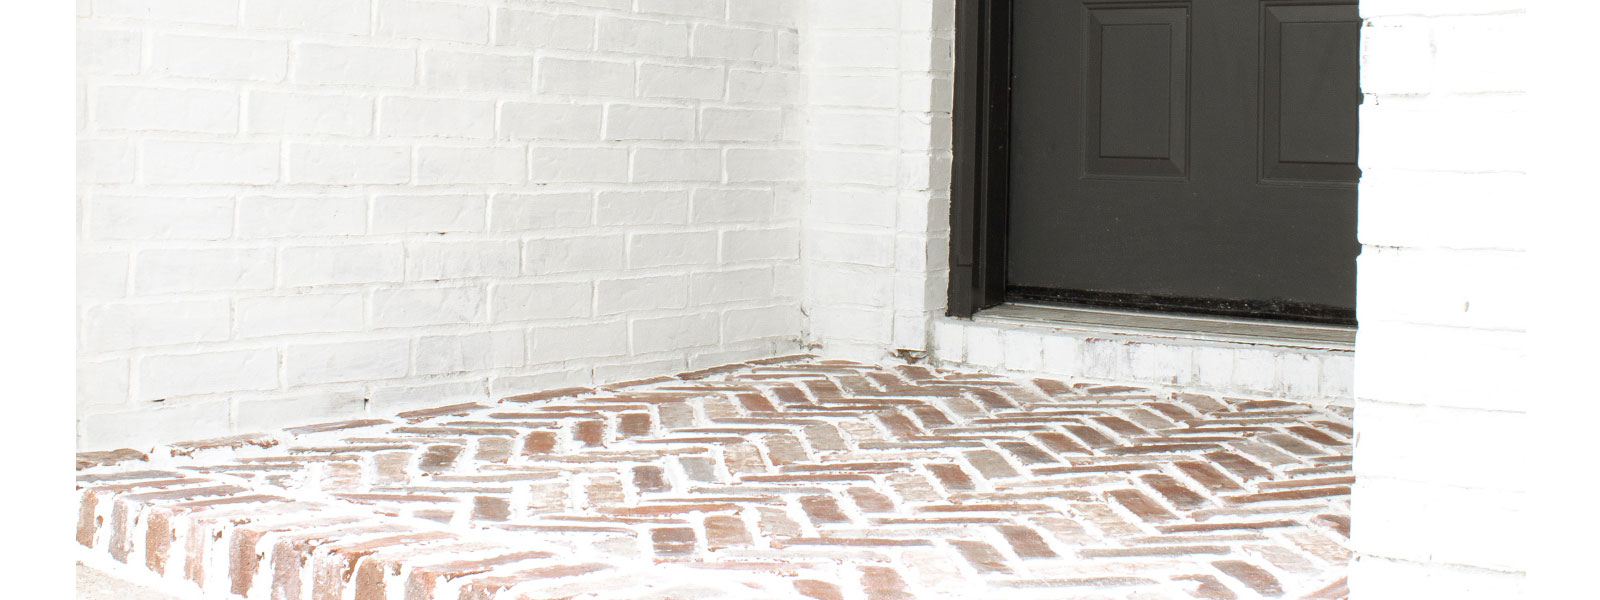 WithloveMercedes herringbone porch